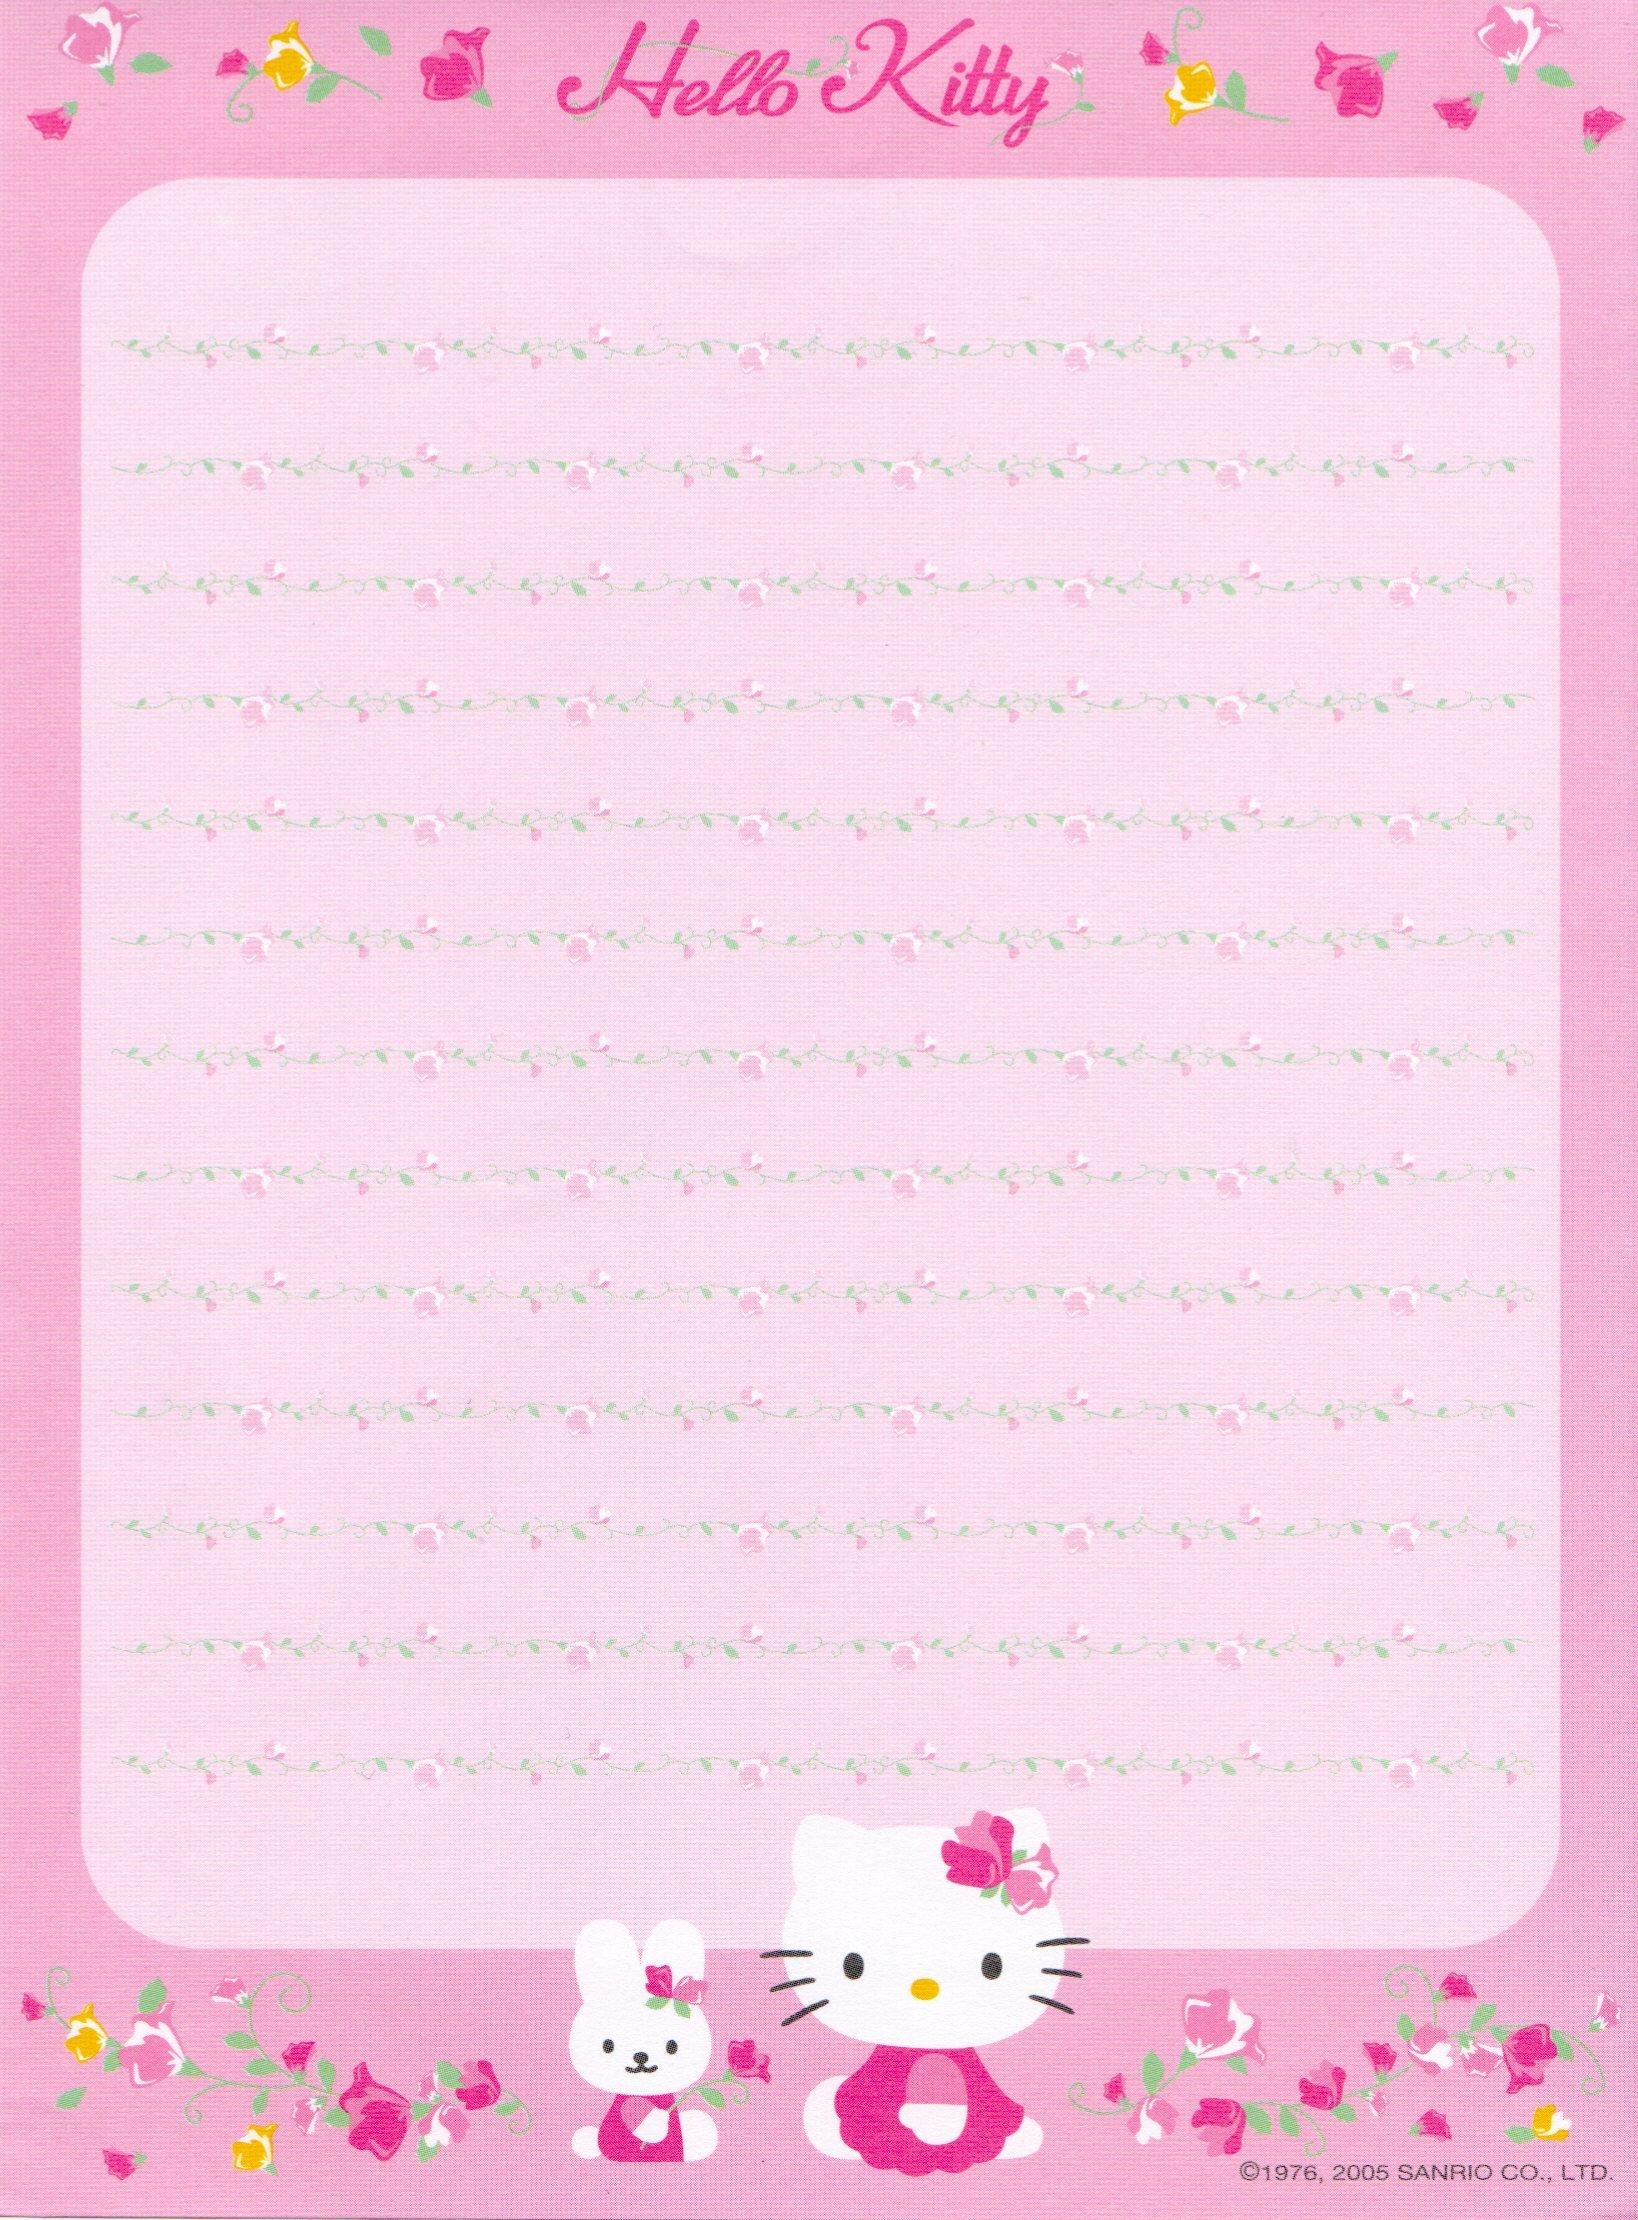 Hello Kitty | Borders,stationary,backgrounds | Hello Kitty, Writing - Free Printable Hello Kitty Stationery